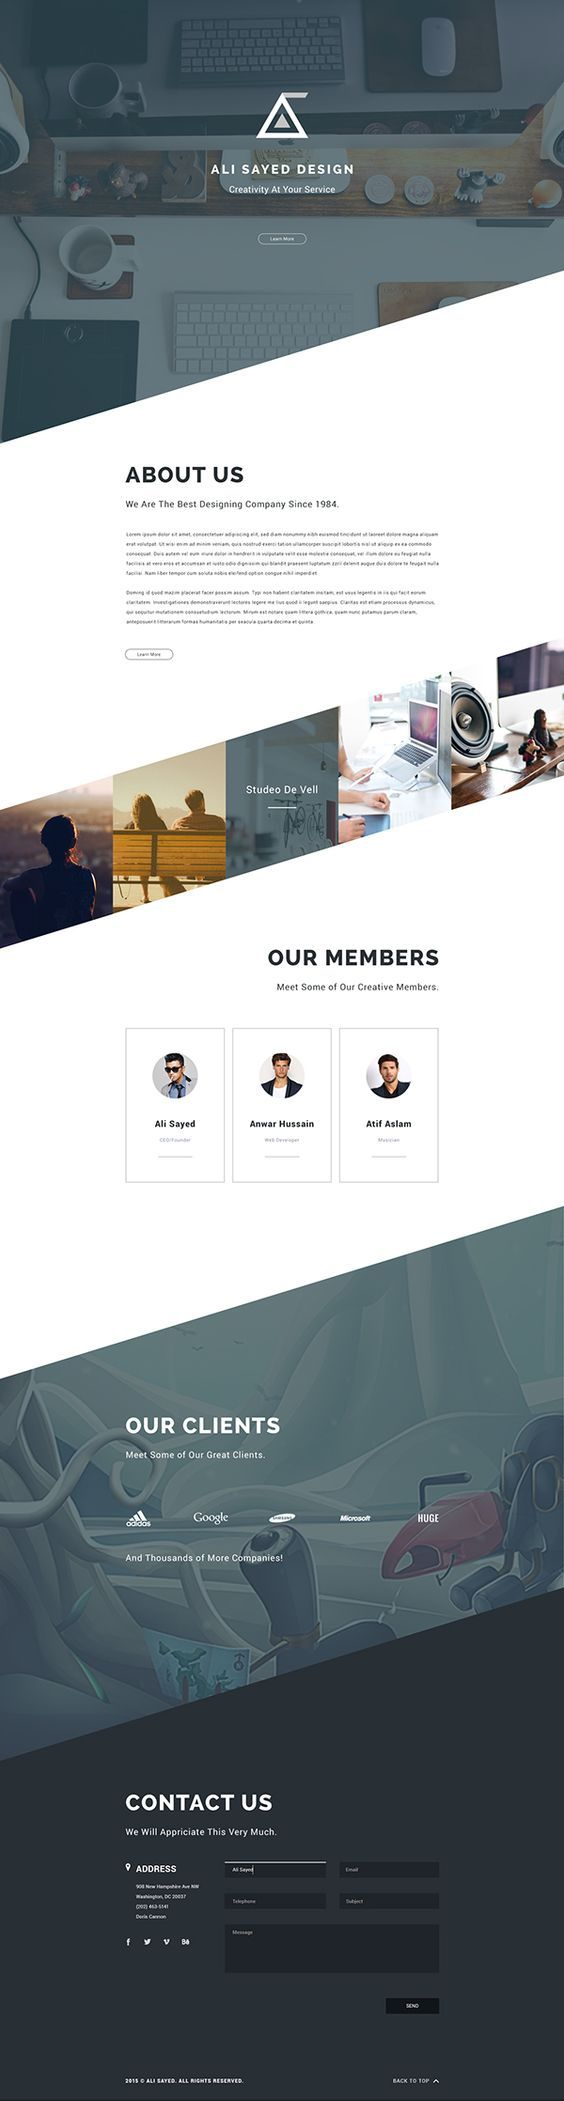 Website Design Inspiration Tips You Can Use When Designing Your Site For More Information Visit Image L Web Template Design Web Layout Design Web Design